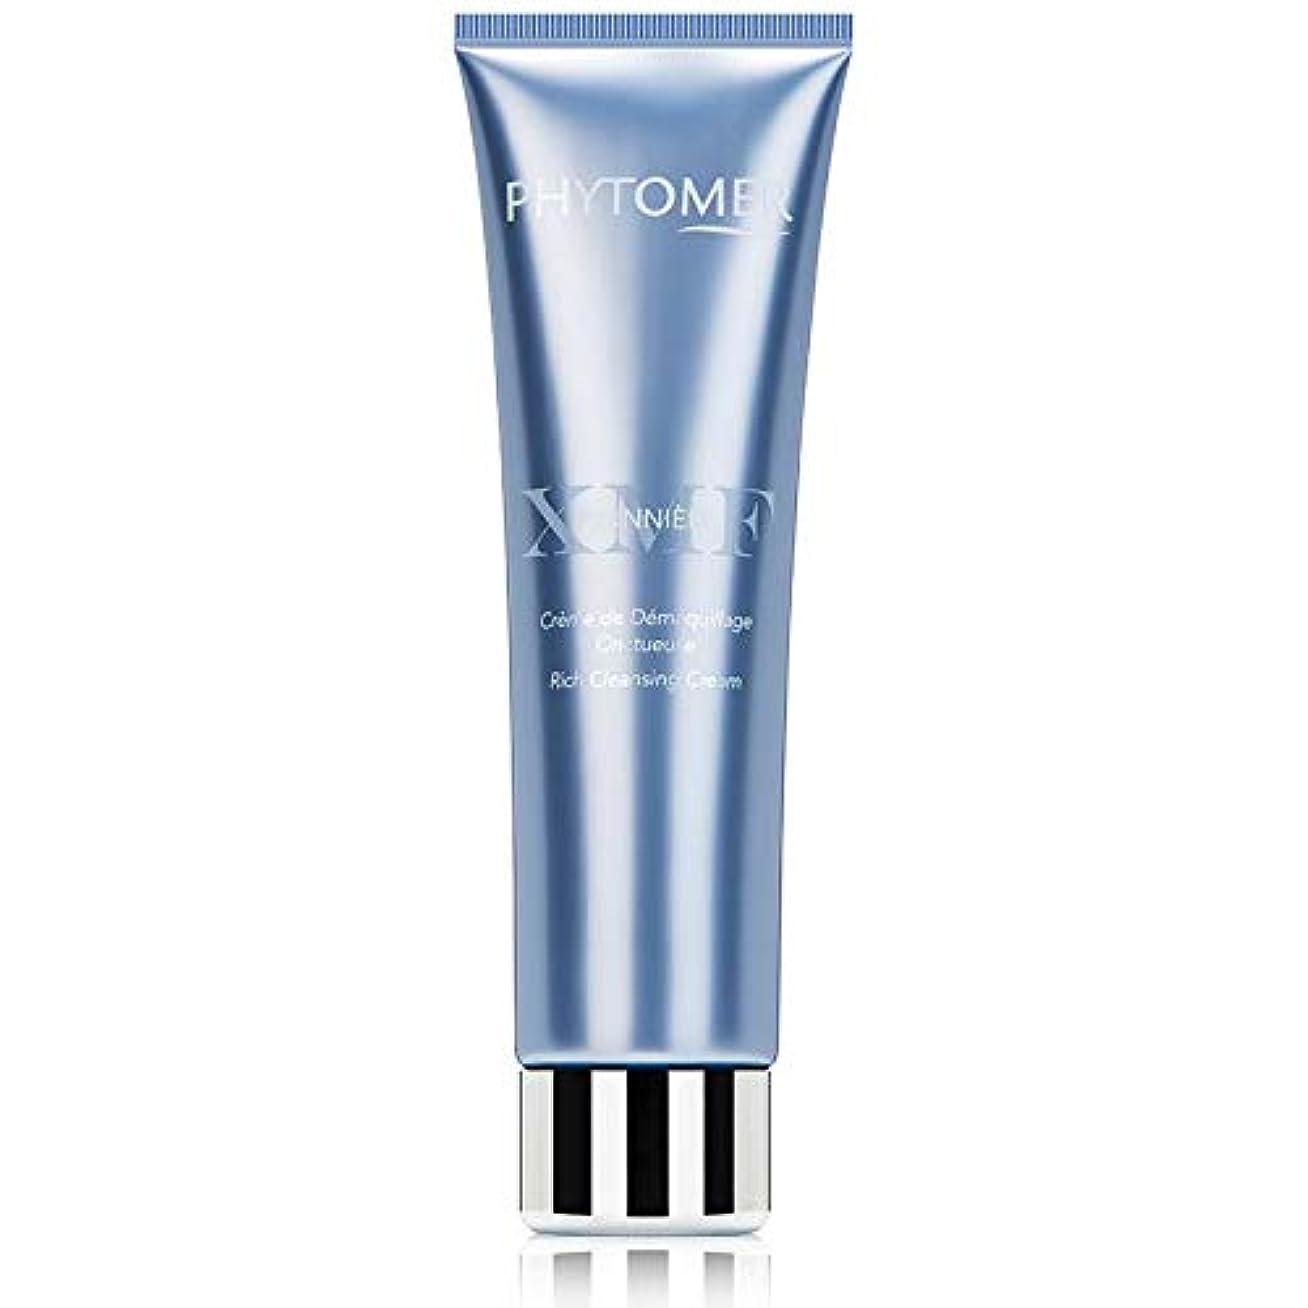 虹繊細意欲Phytomer Pionniere XMF Rich Cleansing Cream 150ml並行輸入品